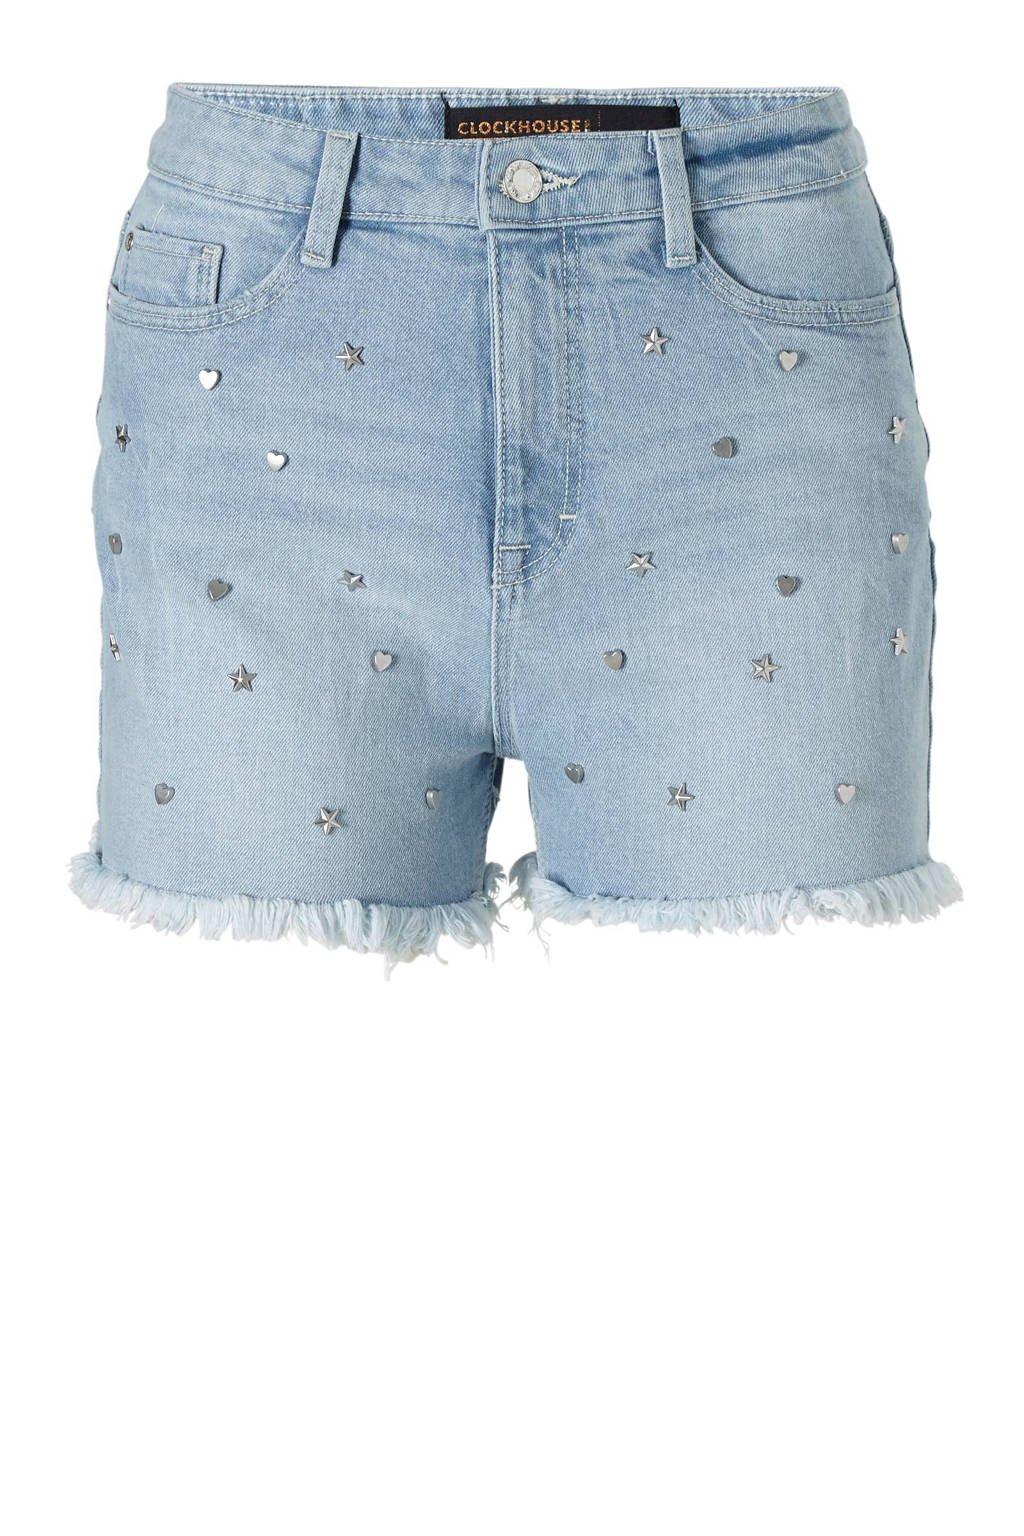 C&A Clockhouse high waisted jeans short met studs, Lichtblauw